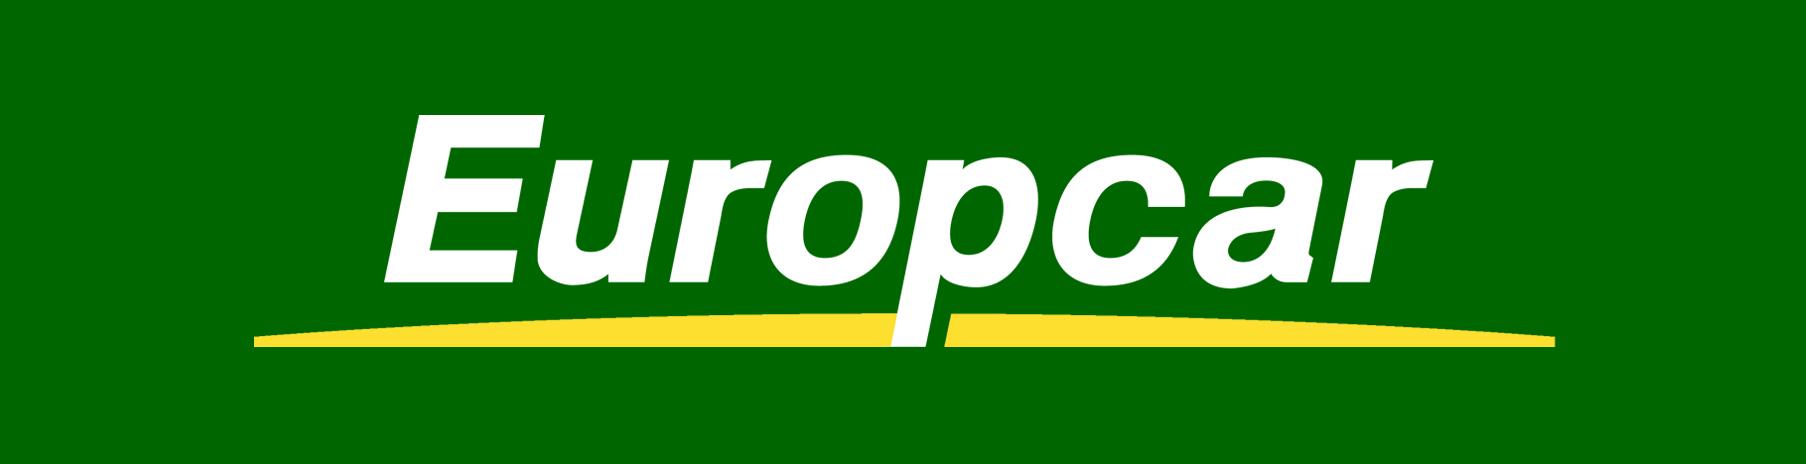 Europcar合作伙伴